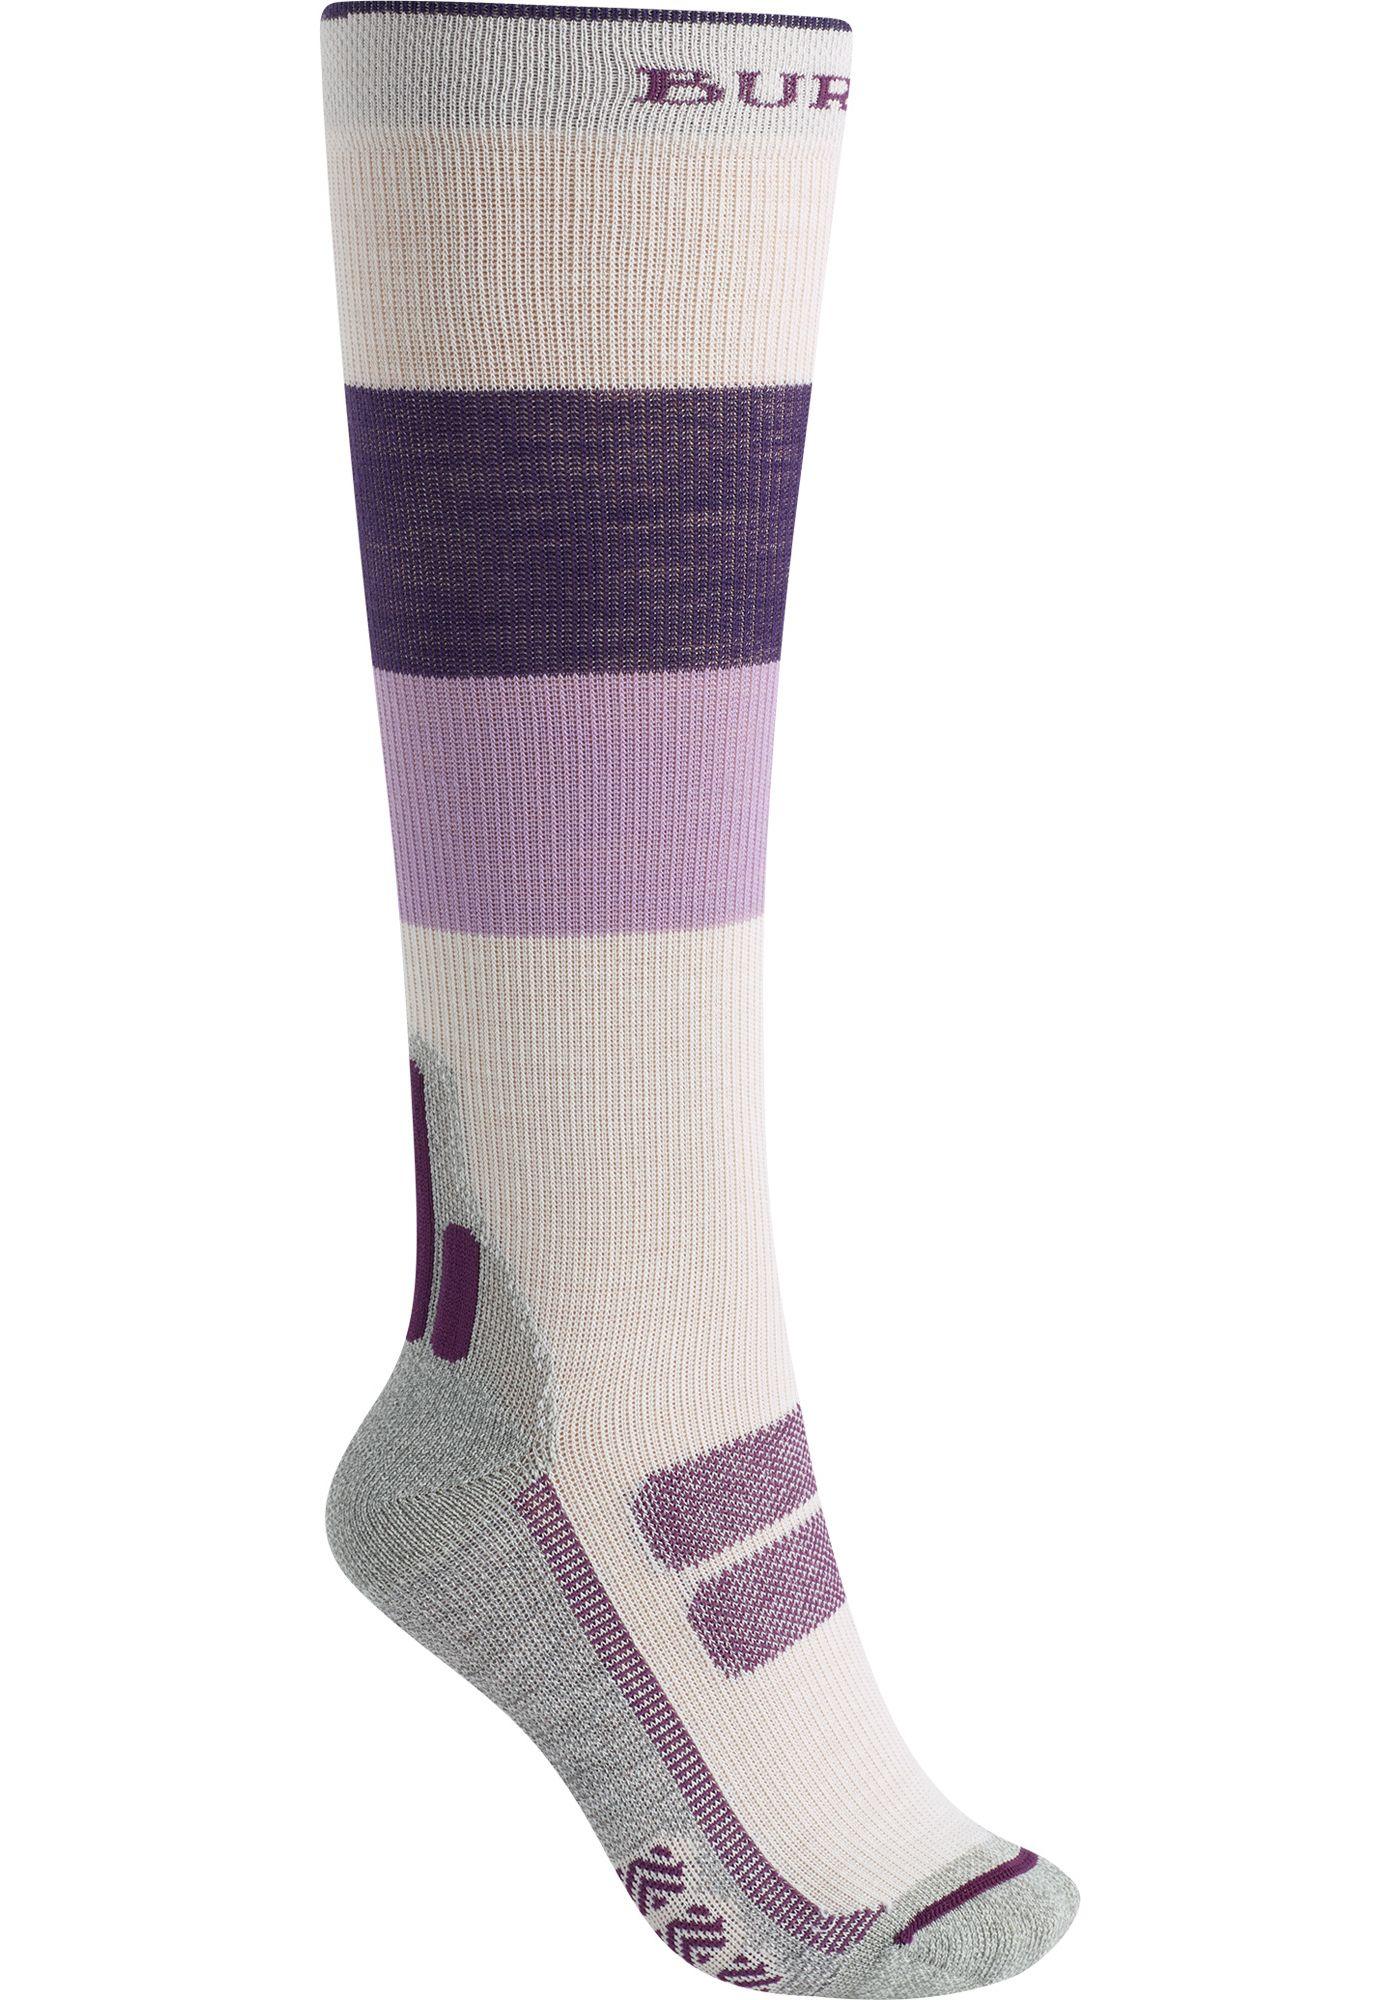 Burton Women's Performance Ultralight Compression Socks